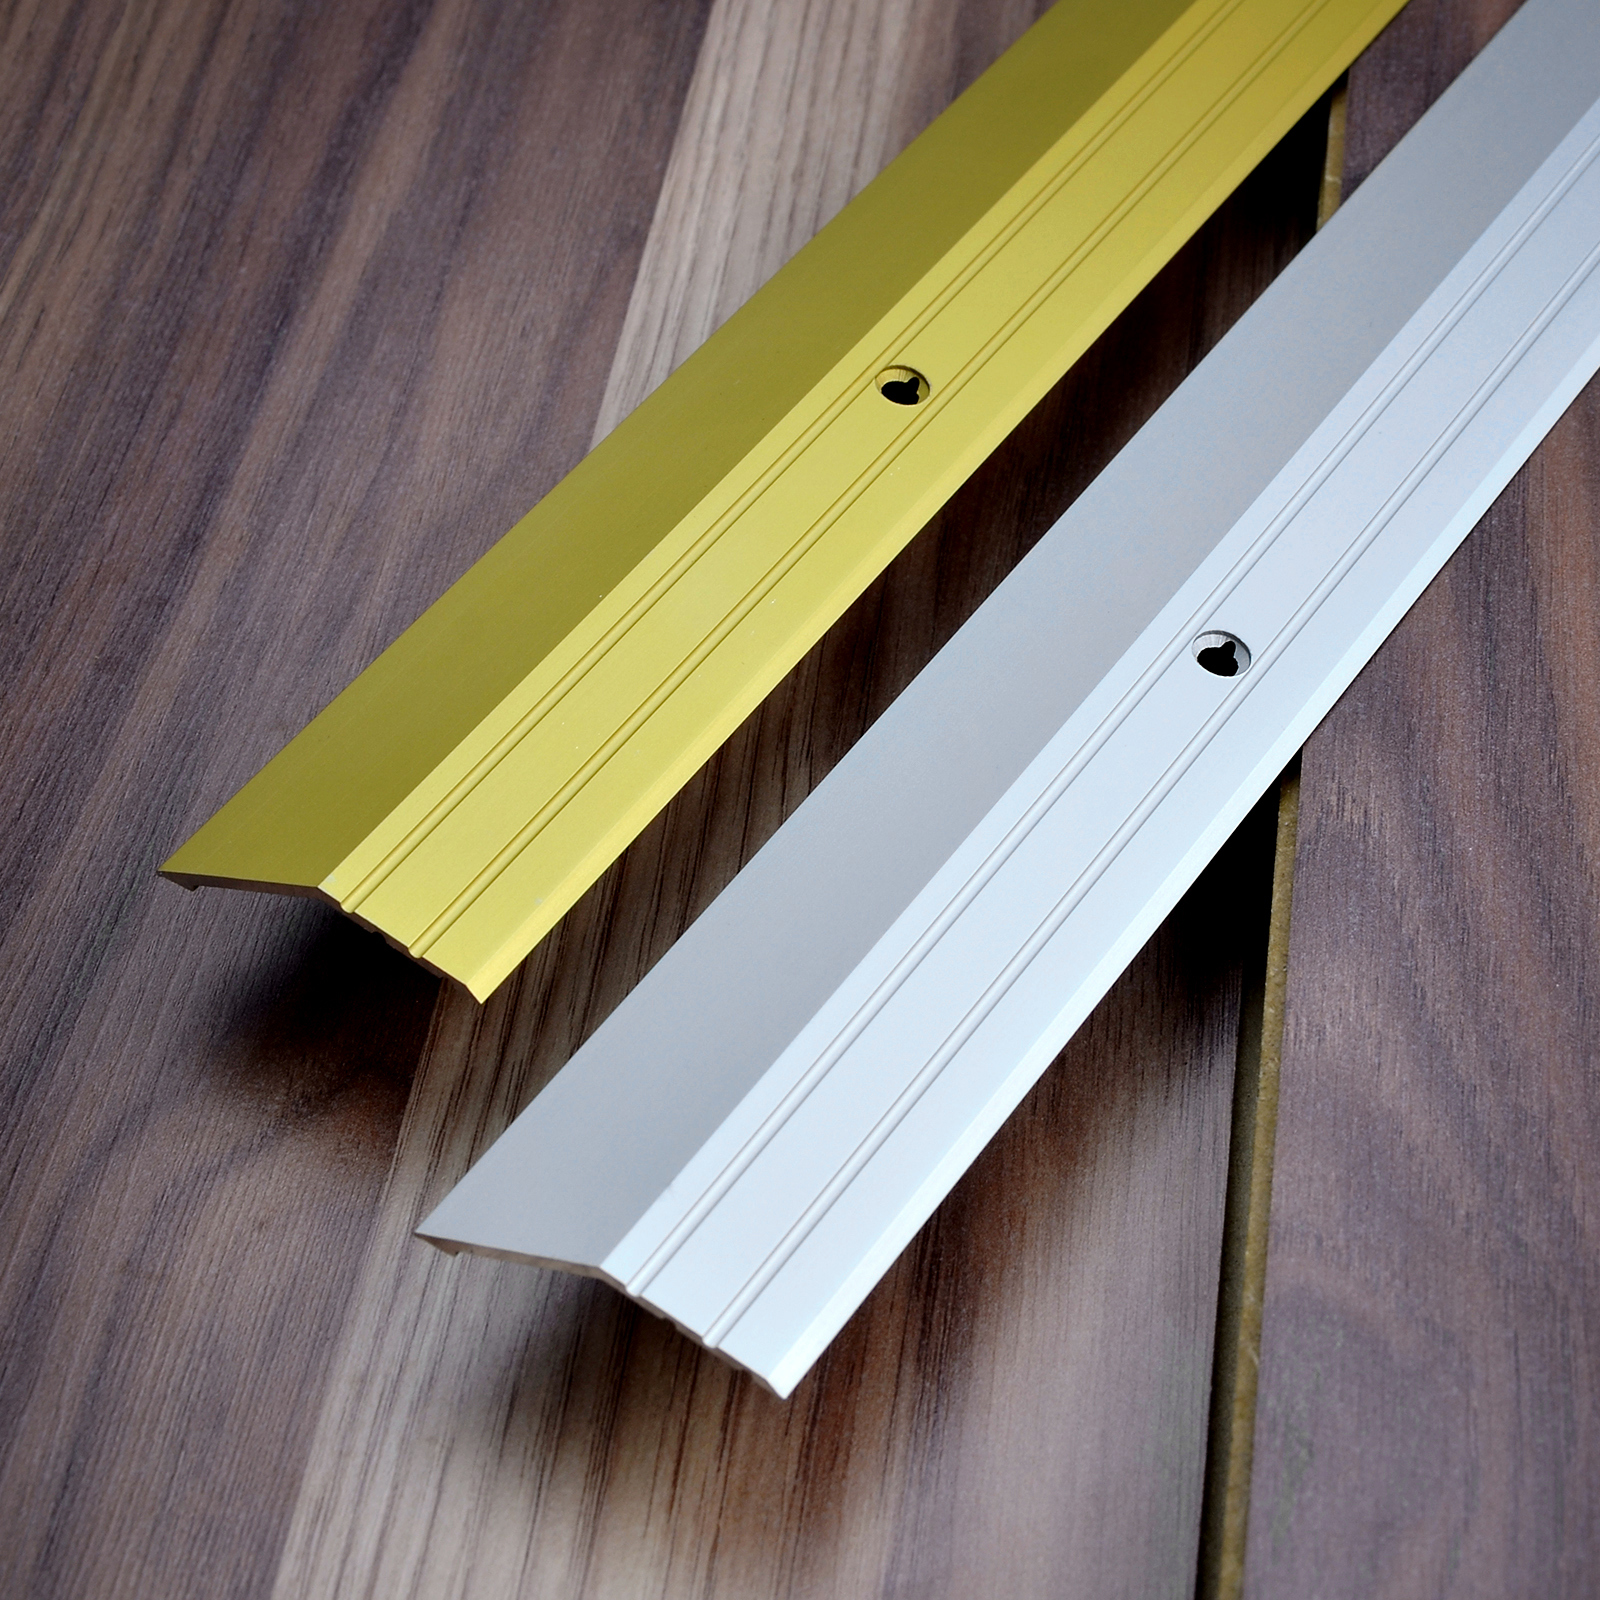 Slanted Transition Strip Aluminium Floor Edge Protection